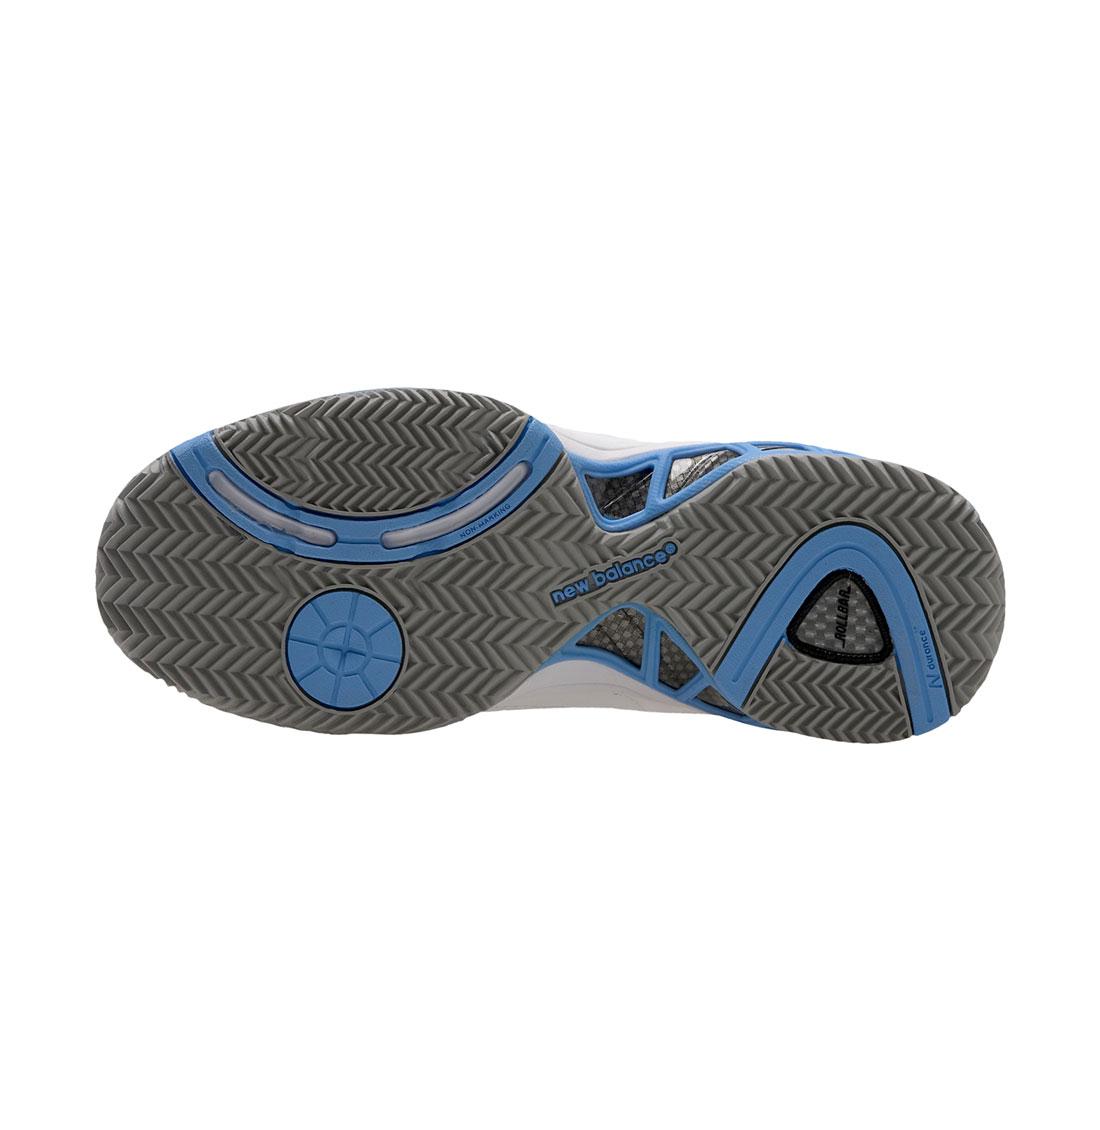 new balance 1005 tennis shoes men's